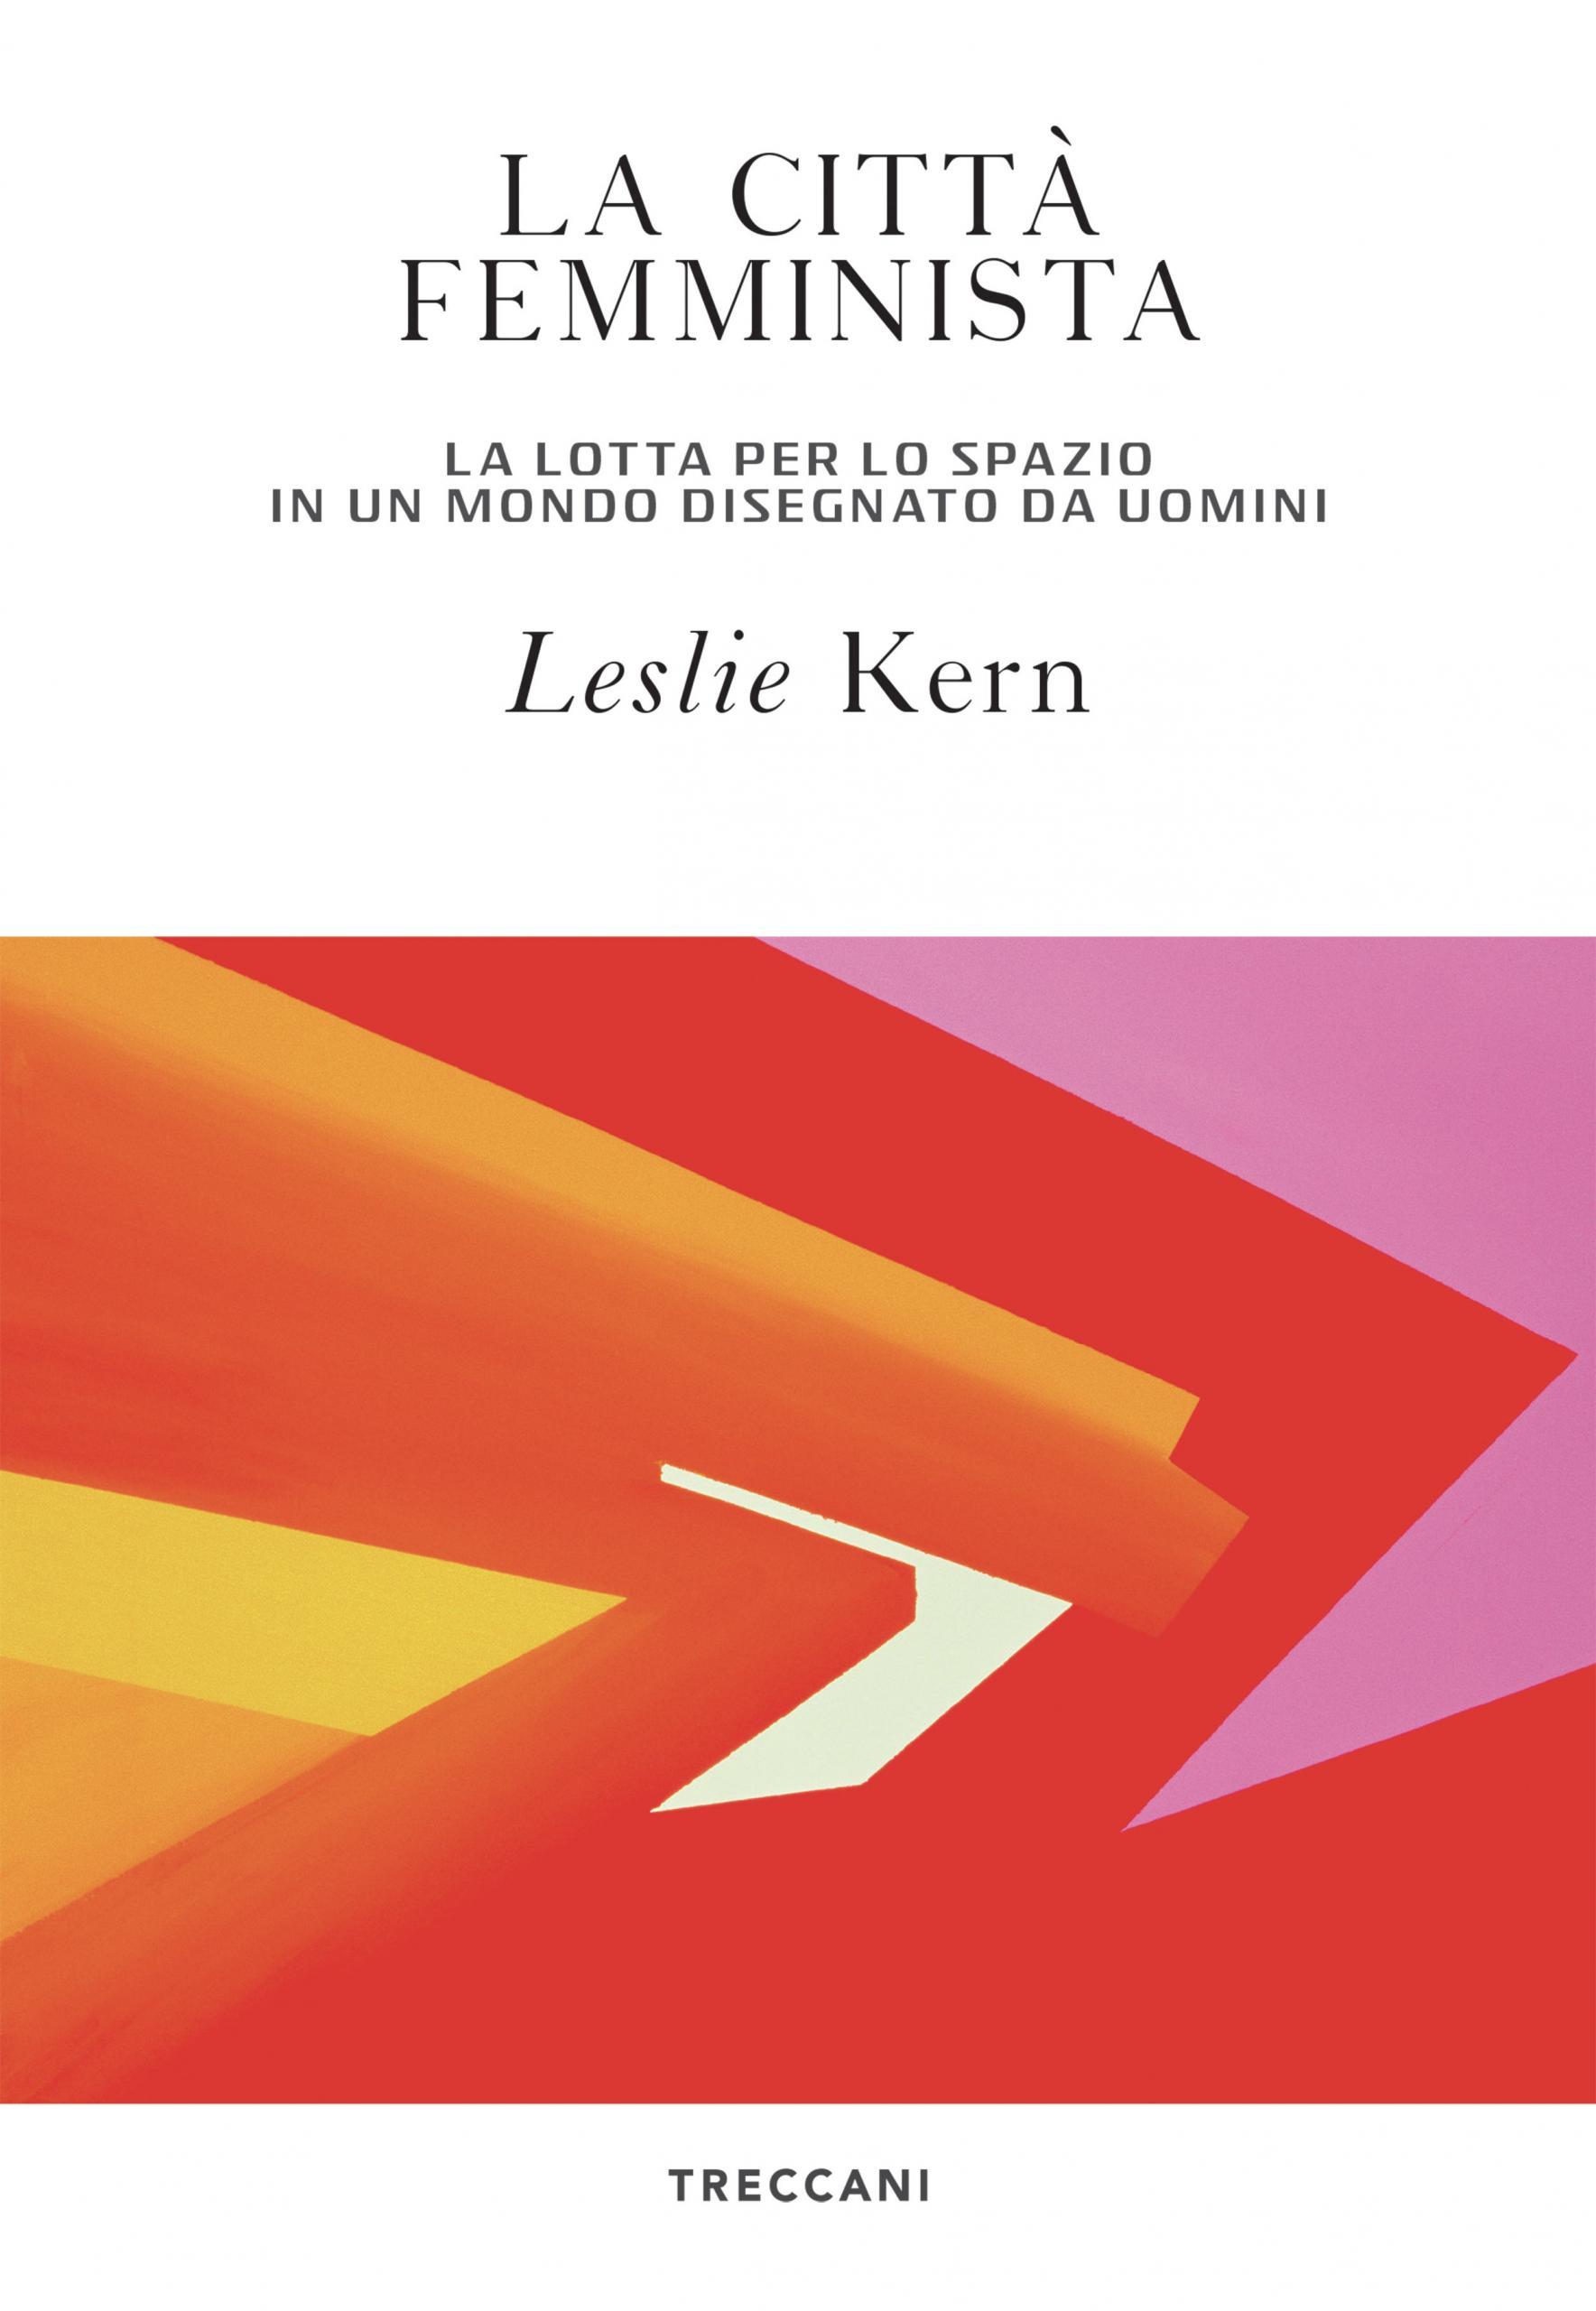 La città femminista, Leslie Kern